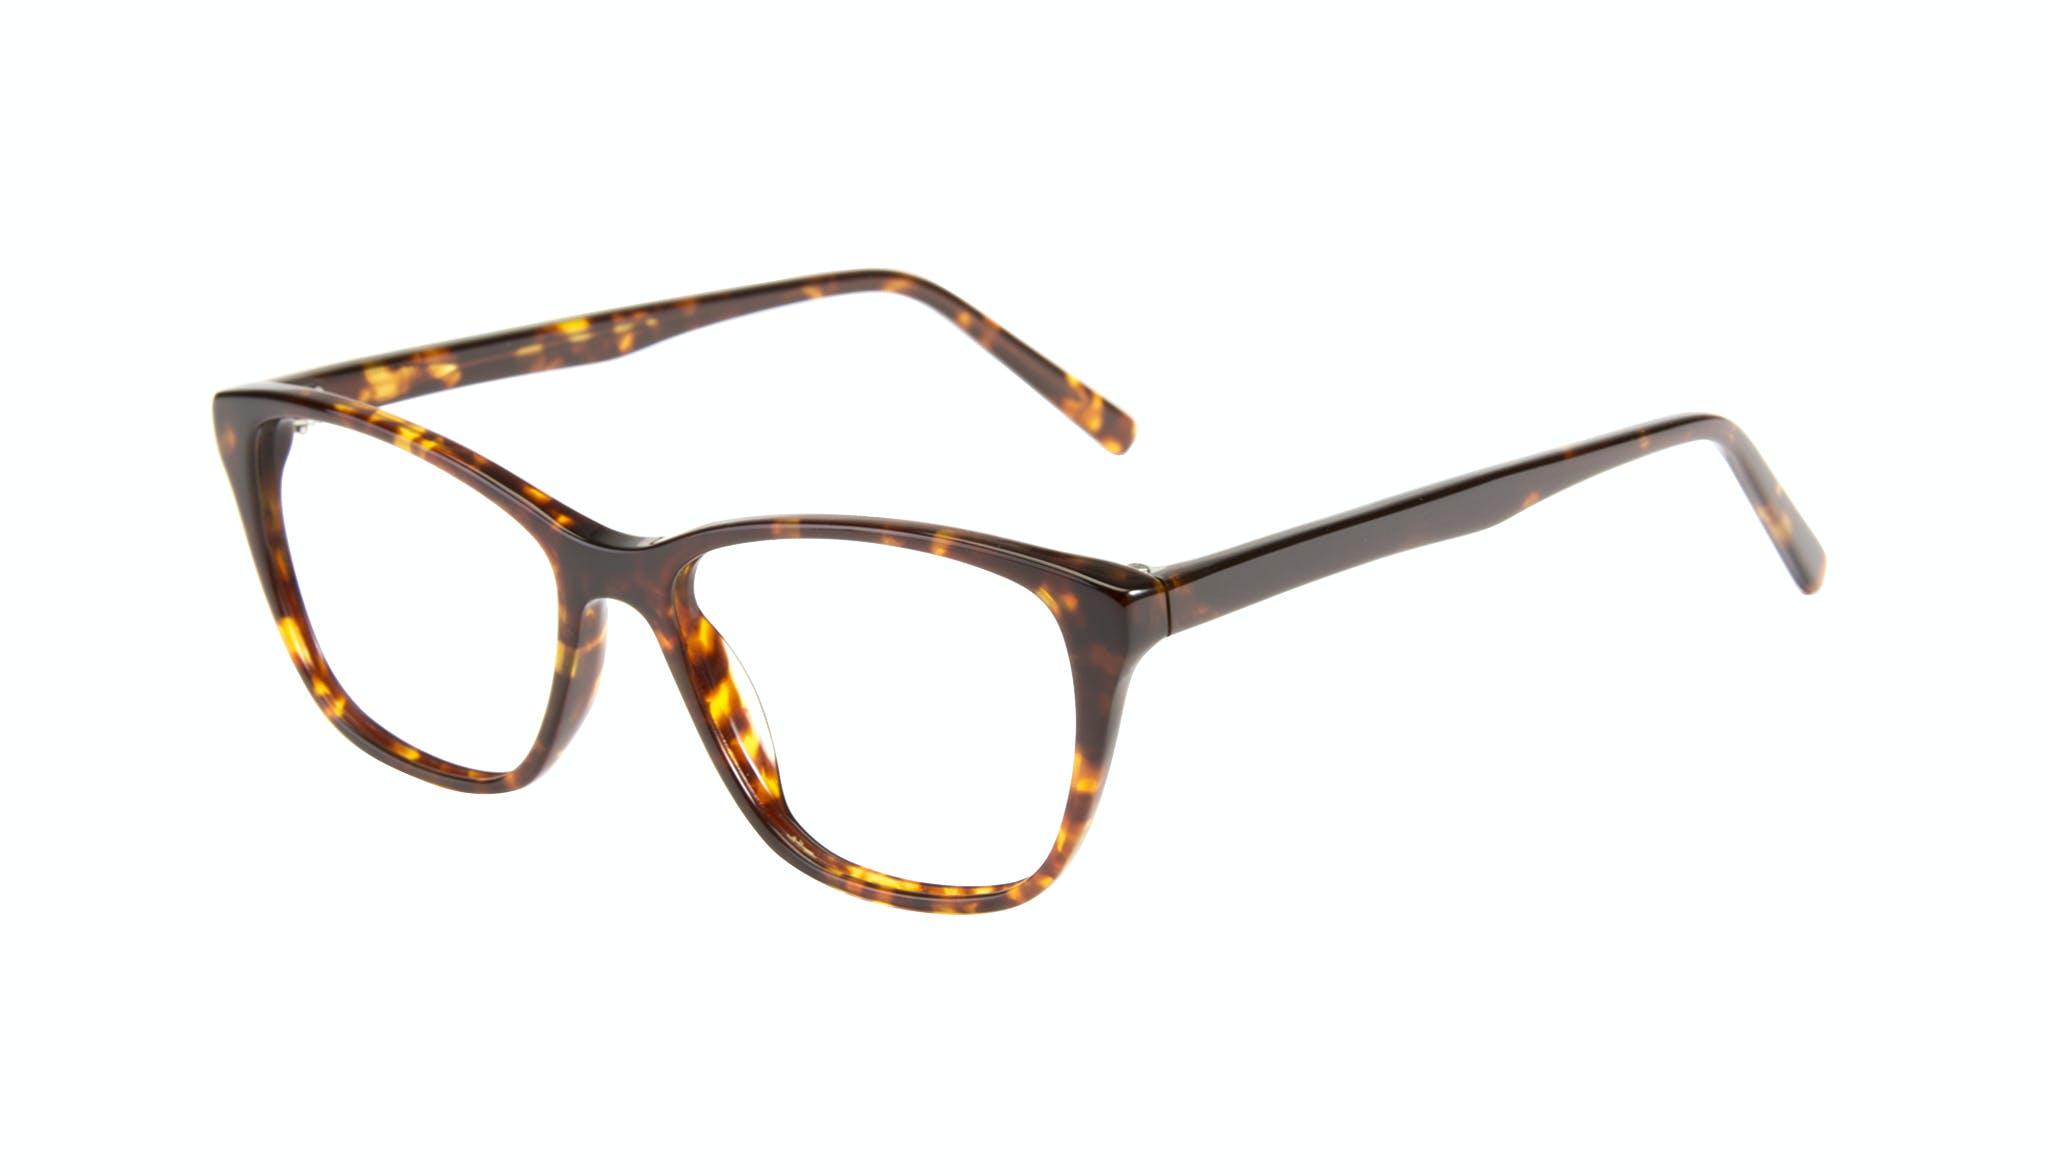 Affordable Fashion Glasses Cat Eye Eyeglasses Women Myrtle Petite Sepia Kiss Tilt